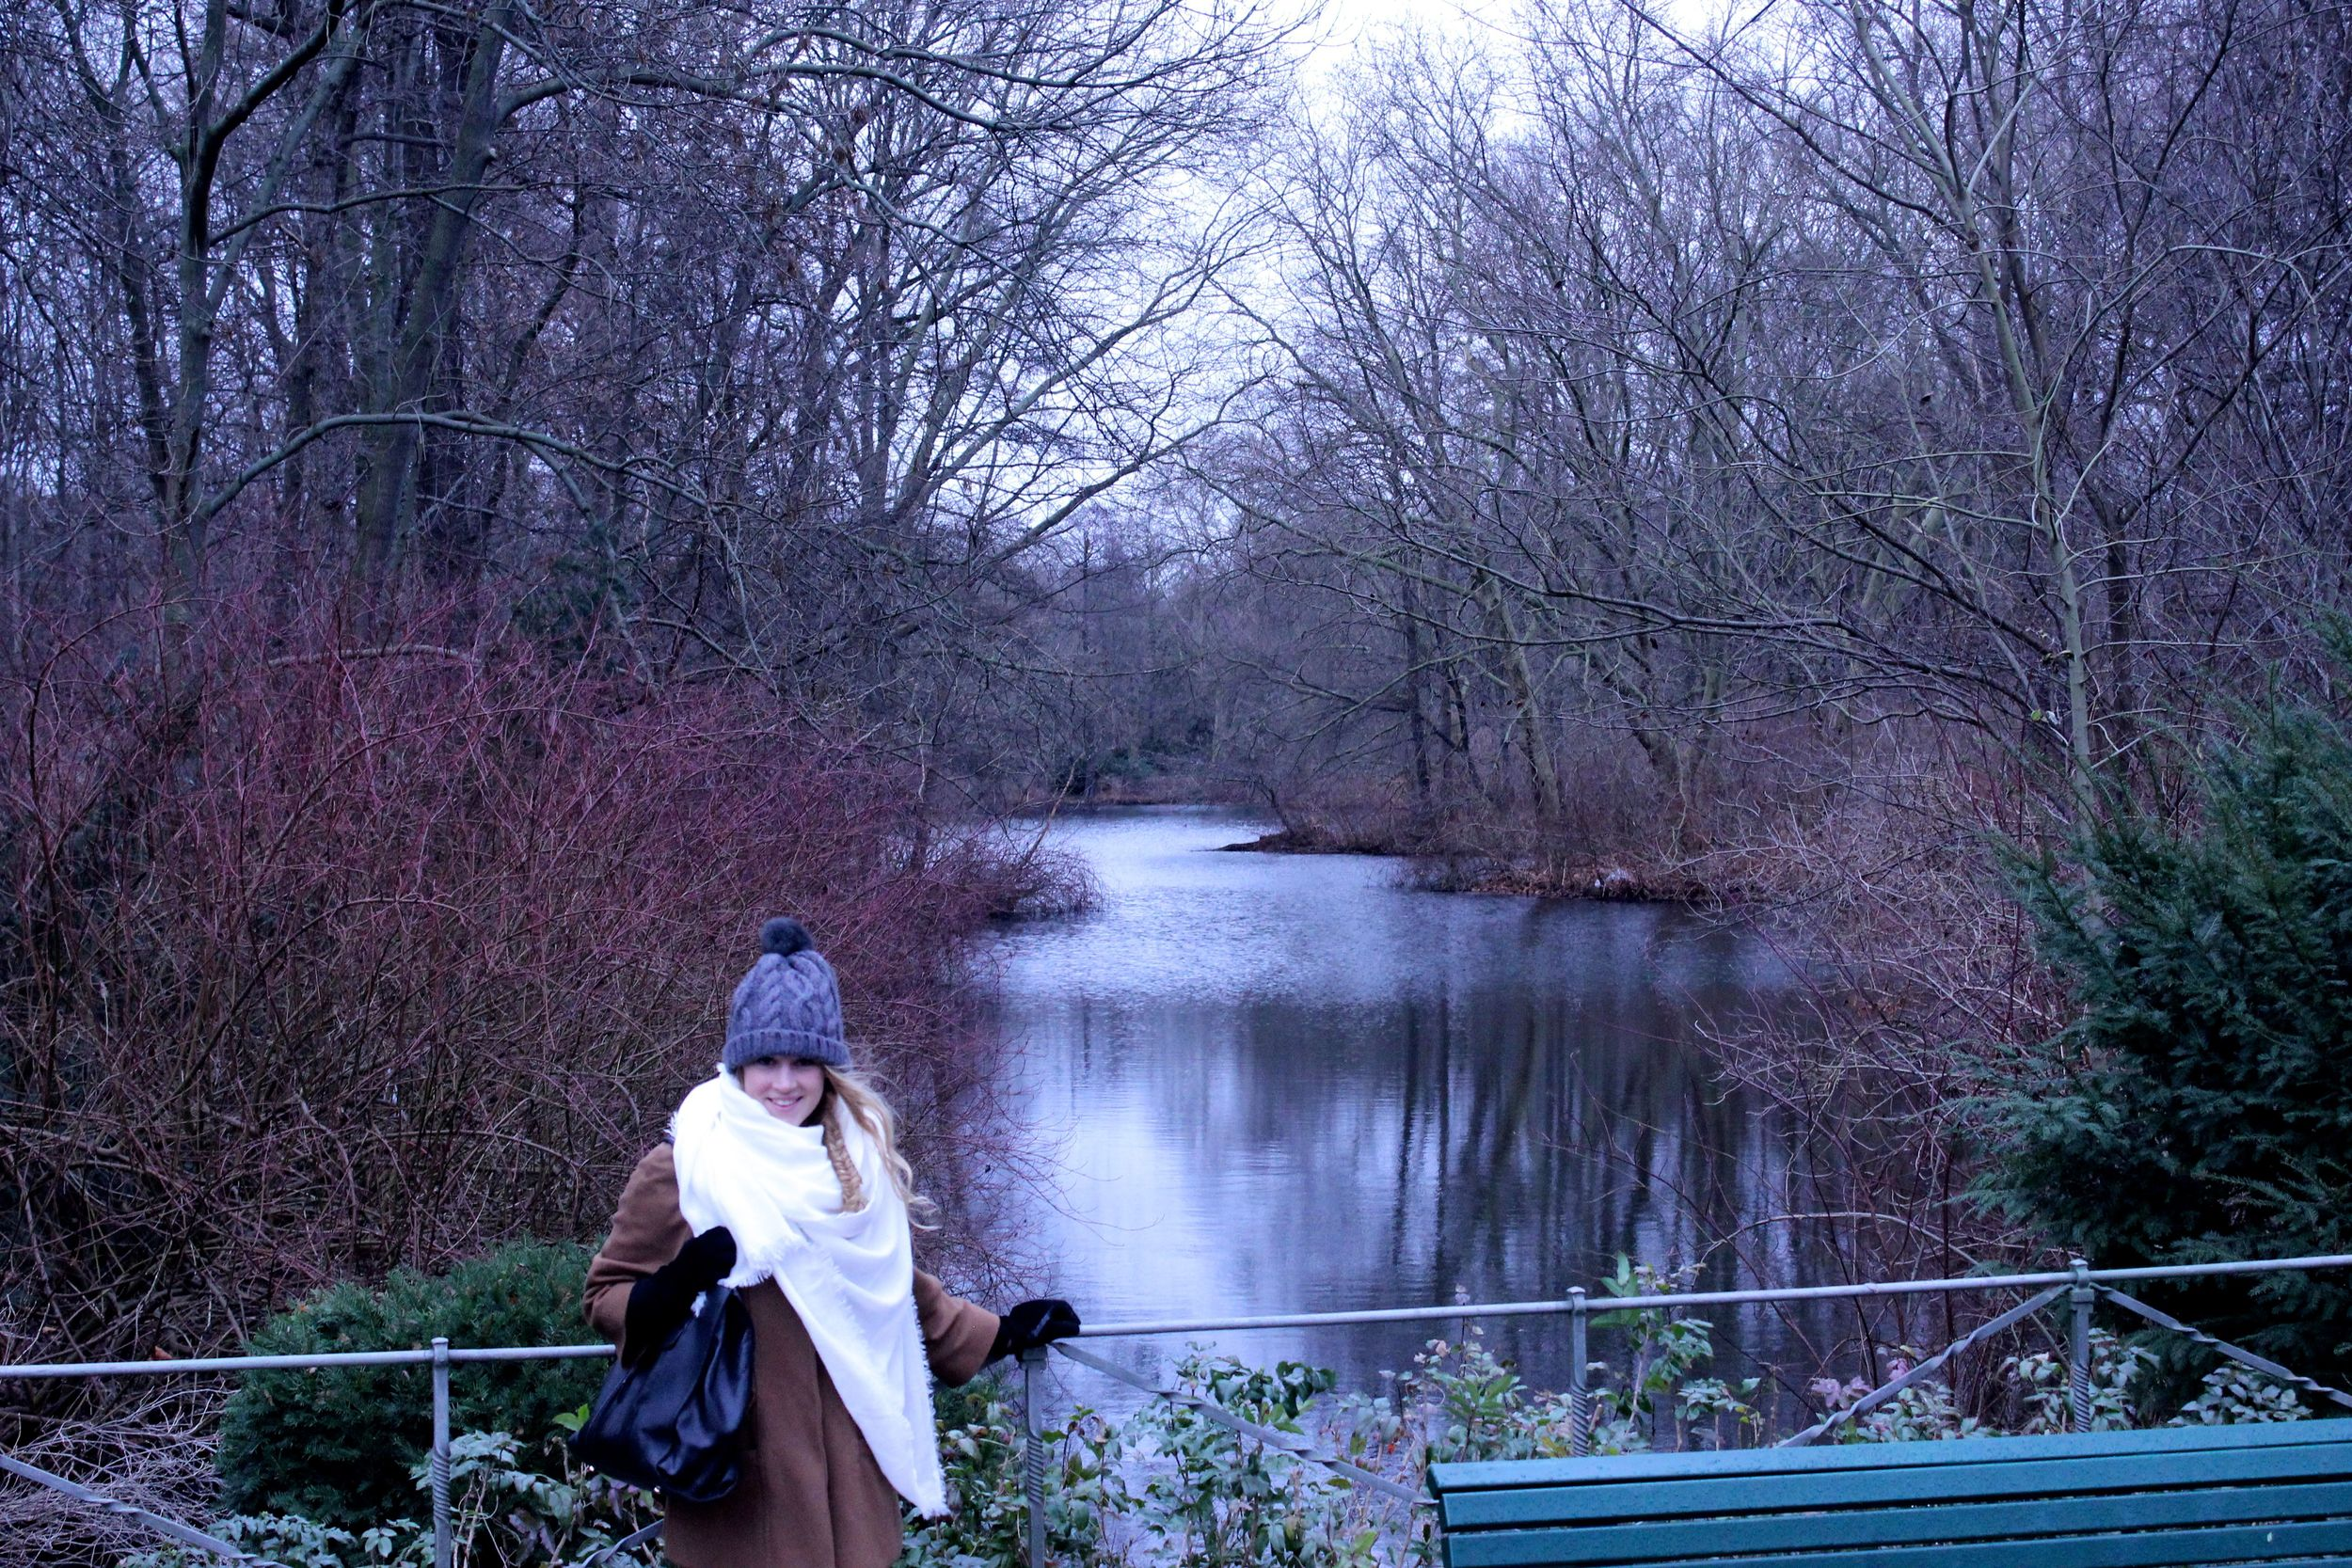 A cloudy day wandering the Tiergarten